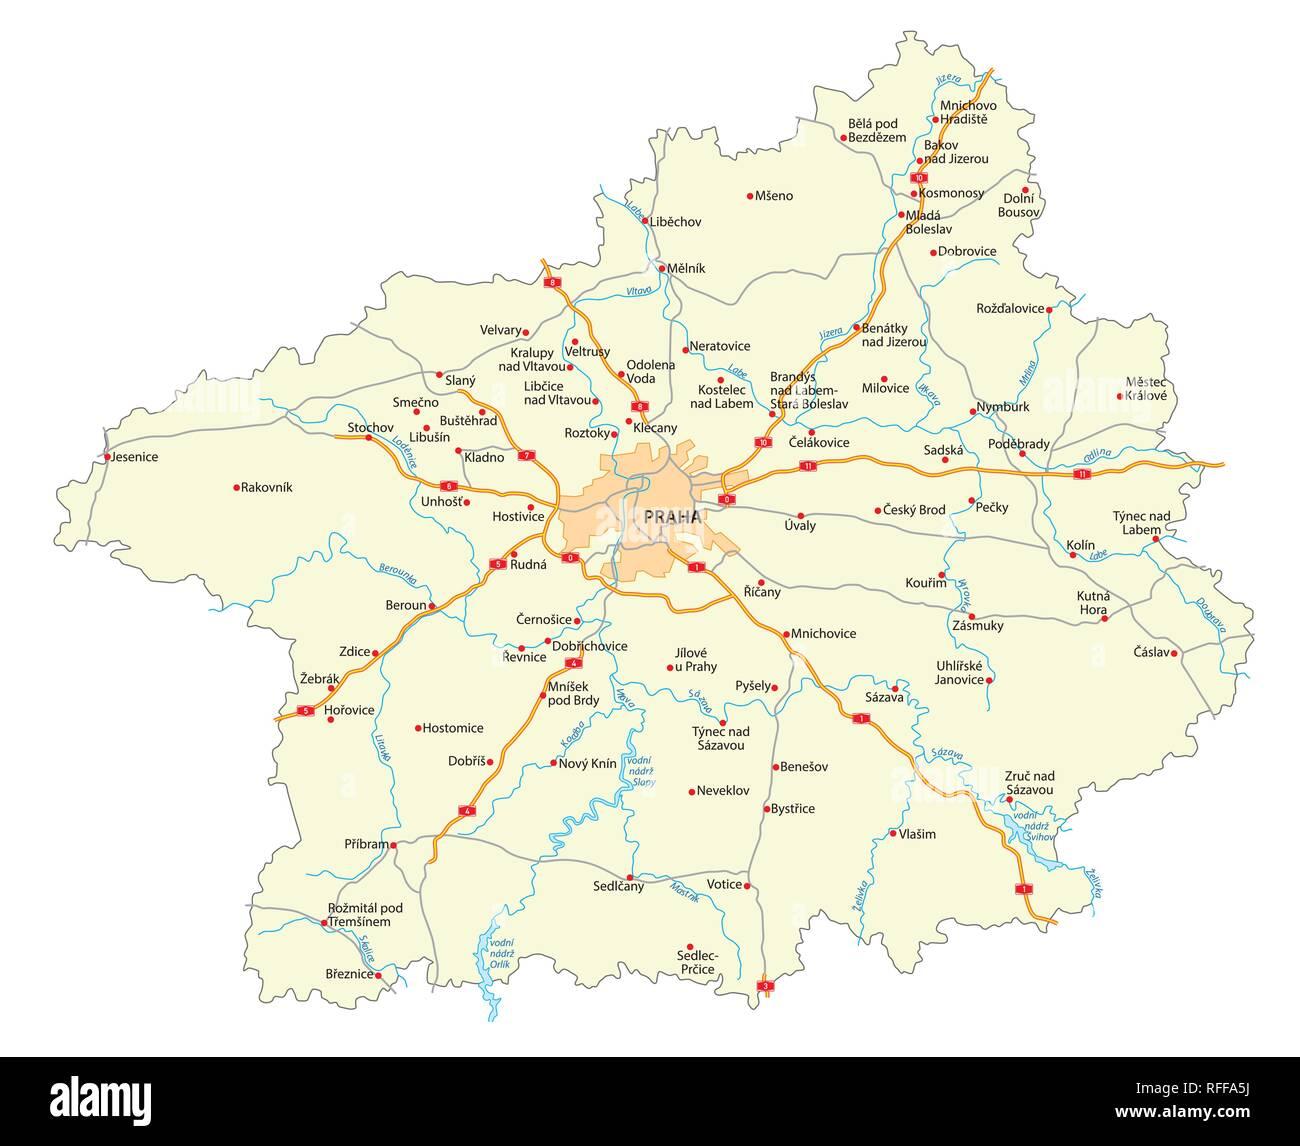 road map of czech region Stredocesky kraj (Central Bohemian) - Stock Image